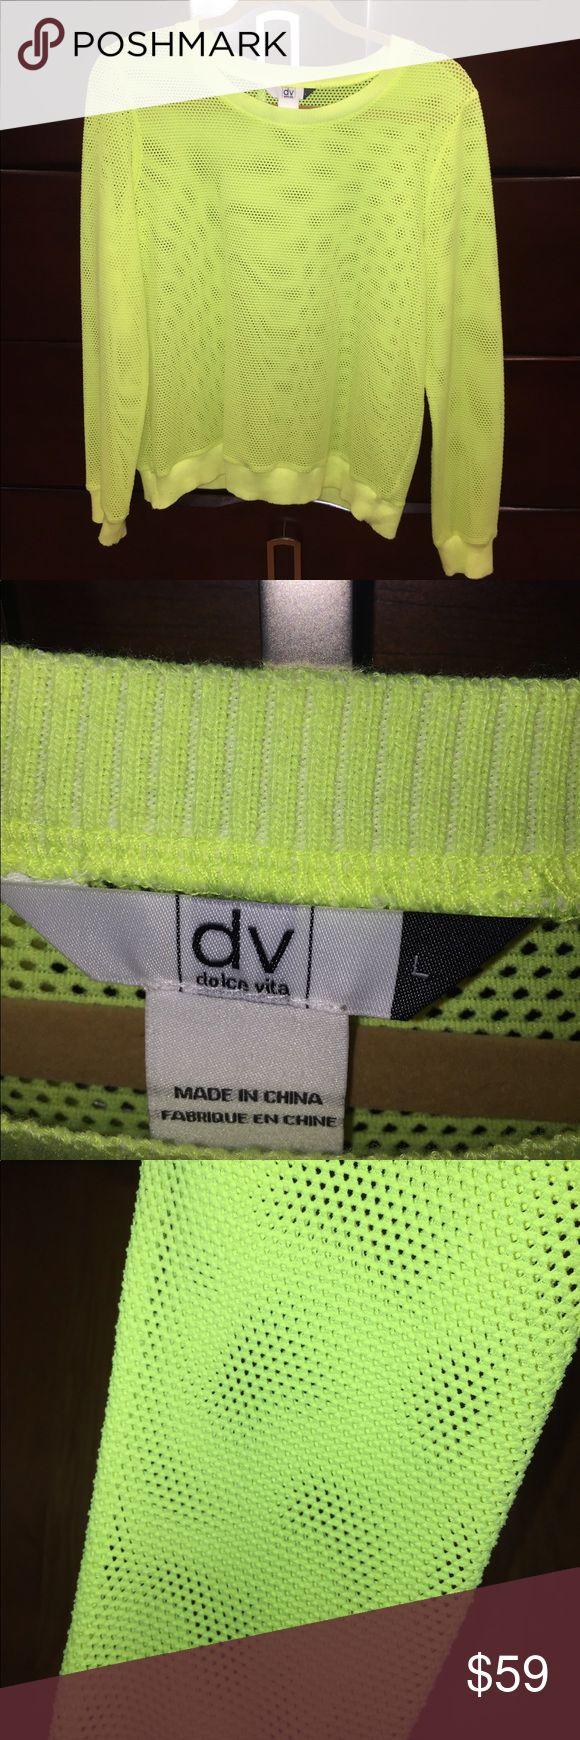 🎉FLASH SALE 🎉 DV long sleeve neon shirt. Size L DV long sleeve neon yellow shirt. Size Large DV by Dolce Vita Tops Tees - Long Sleeve